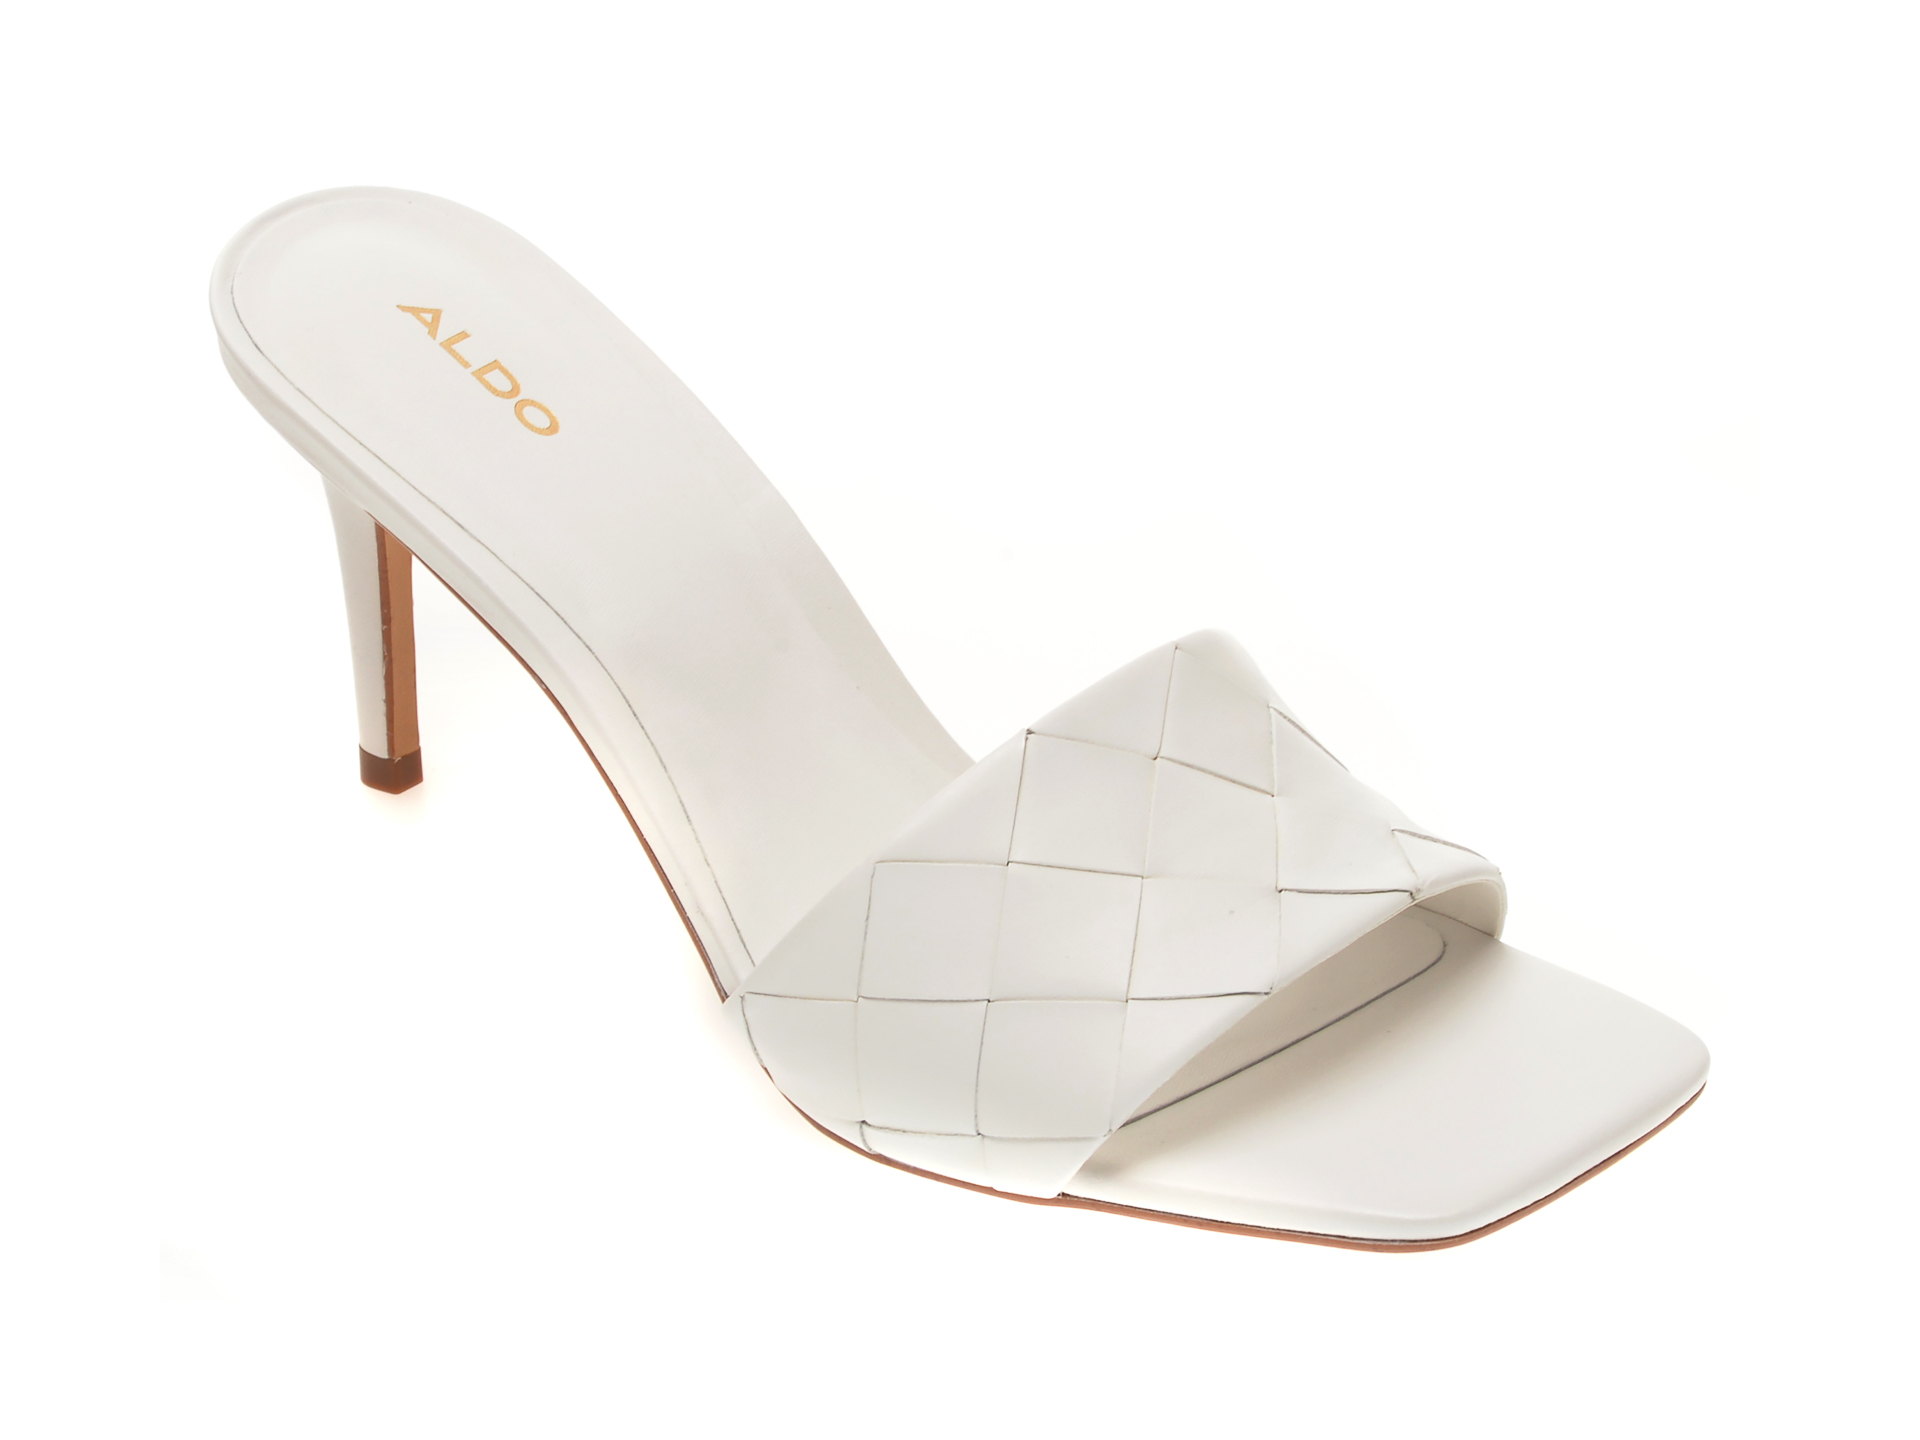 Sandale ALDO albe, Acendan100, din piele naturala imagine otter.ro 2021